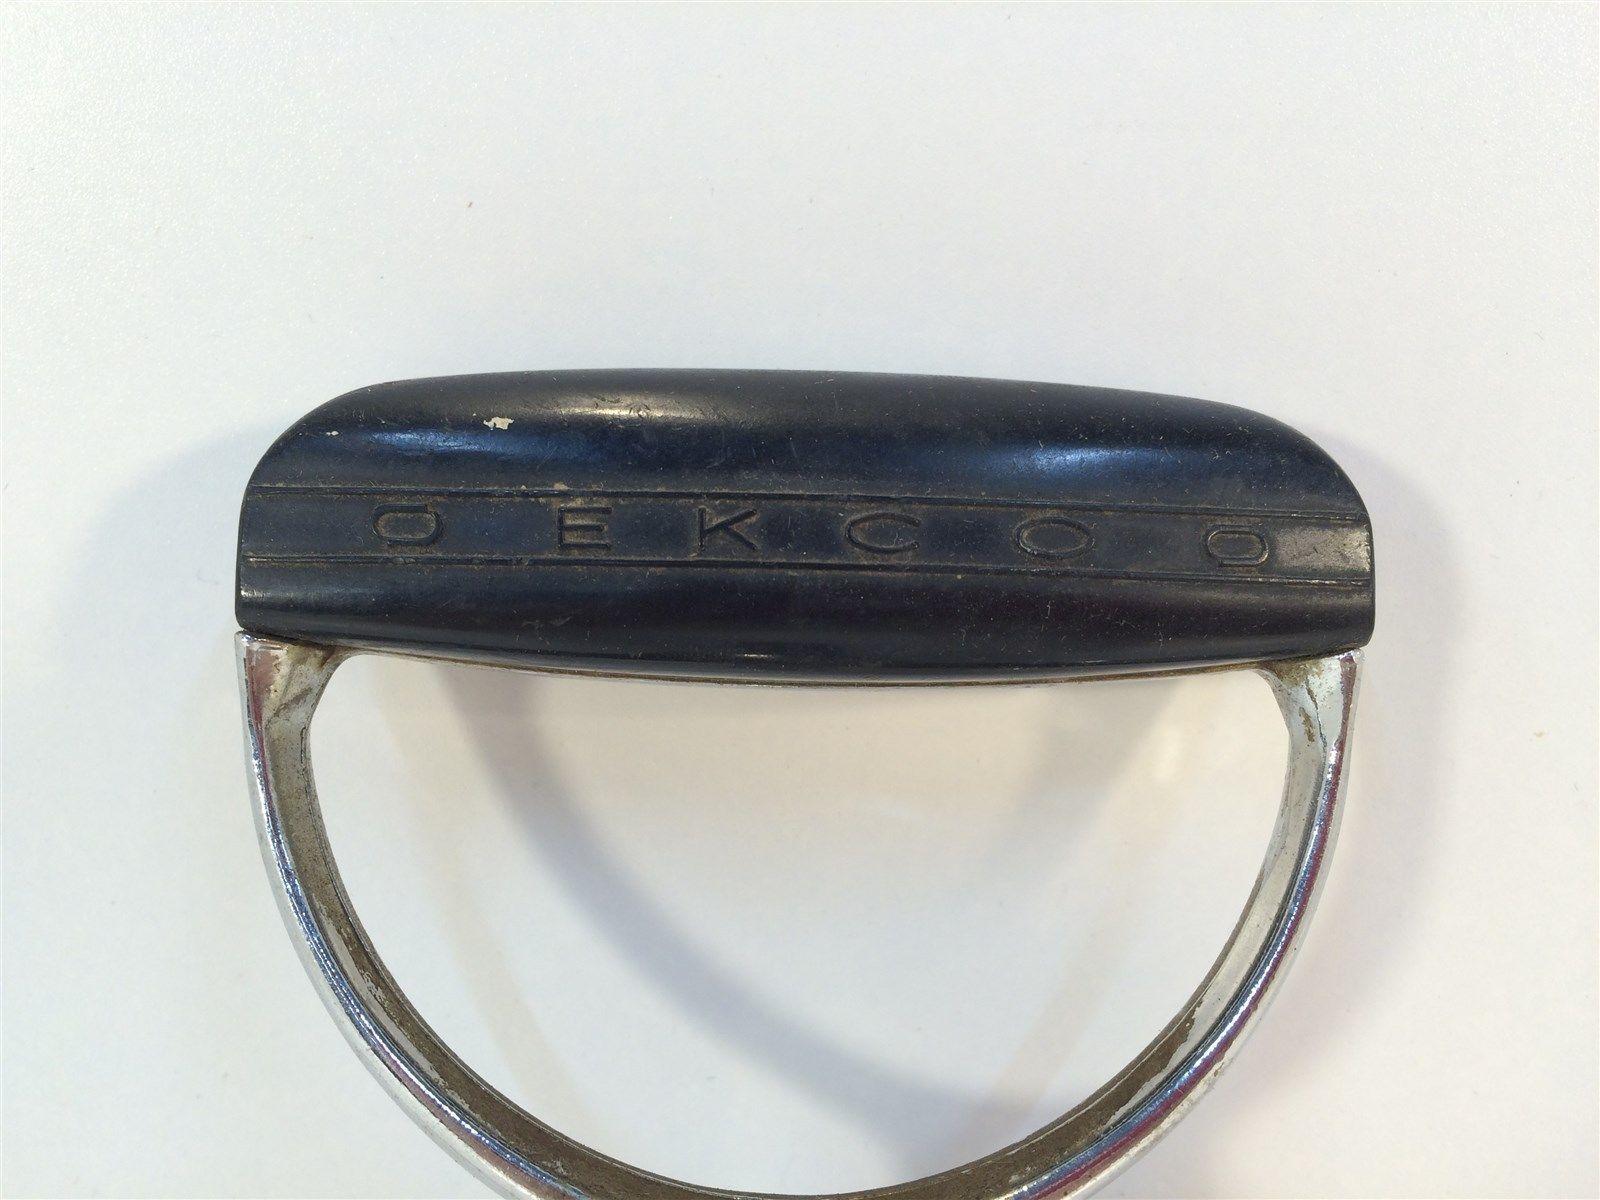 Vintage Egg Beater - EKCO - Black Handle - Made in USA - Heavy image 2